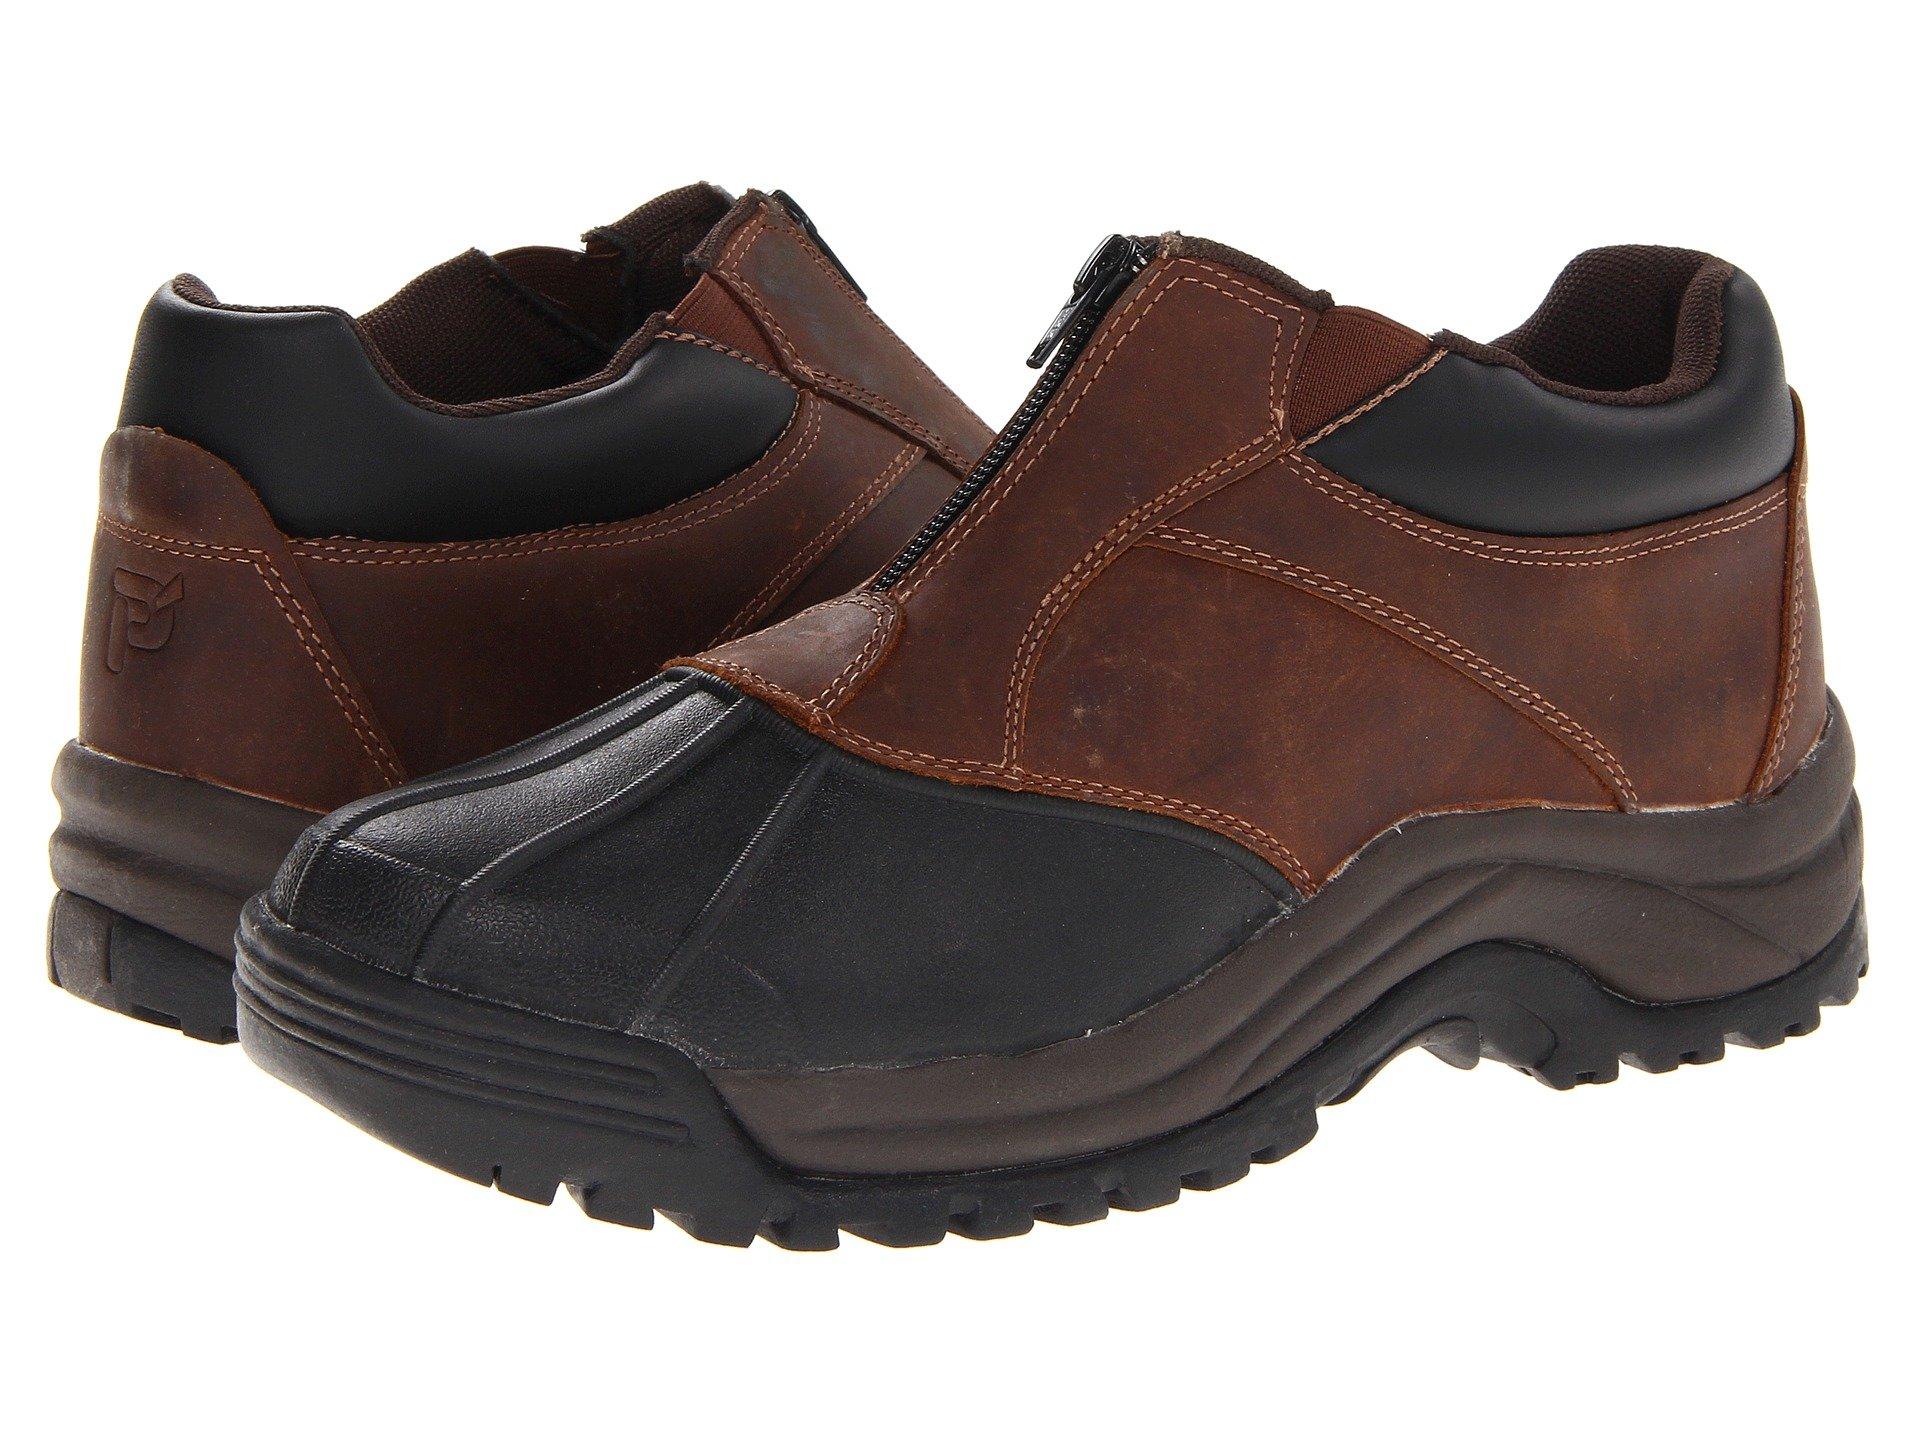 9d8951d432d2c Men s Waterproof Boots + FREE SHIPPING